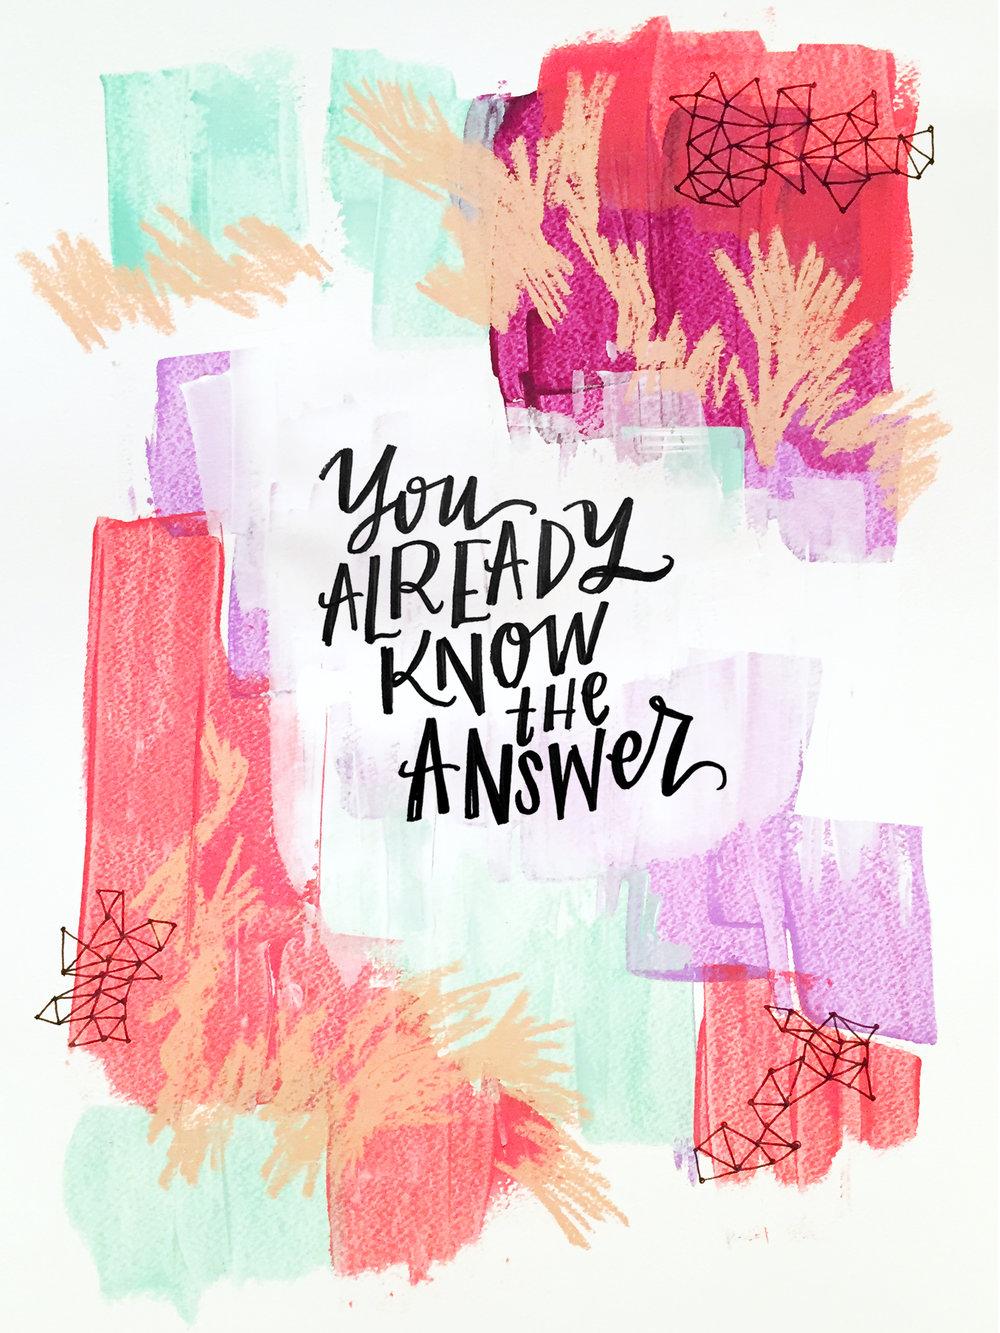 3/3/16: Answer